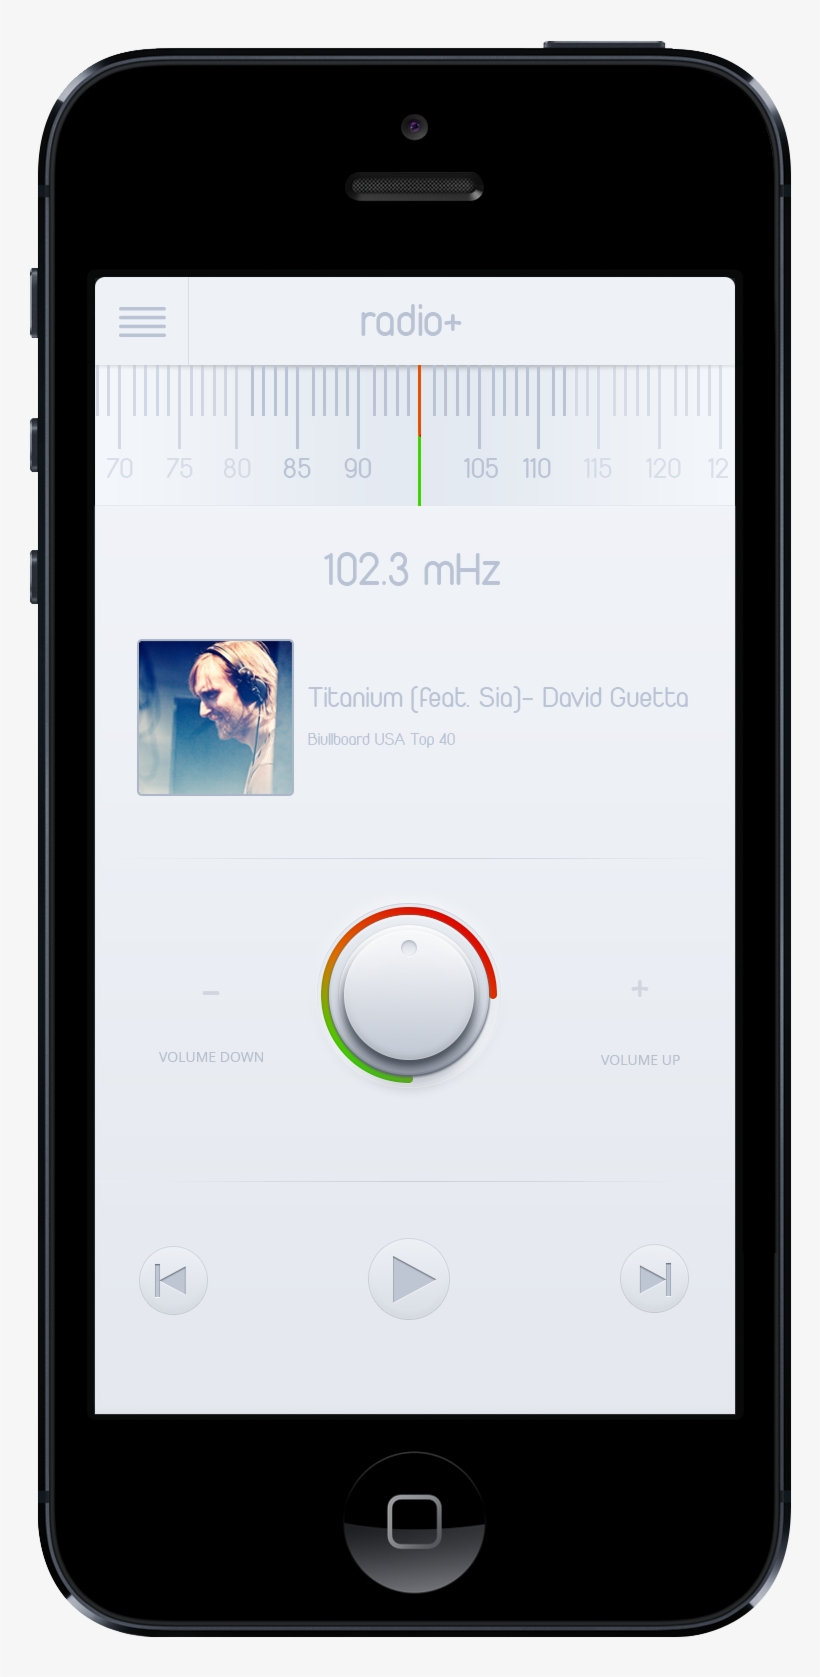 Radio App Iphone Realpixl - Verifone E335 Transparent PNG